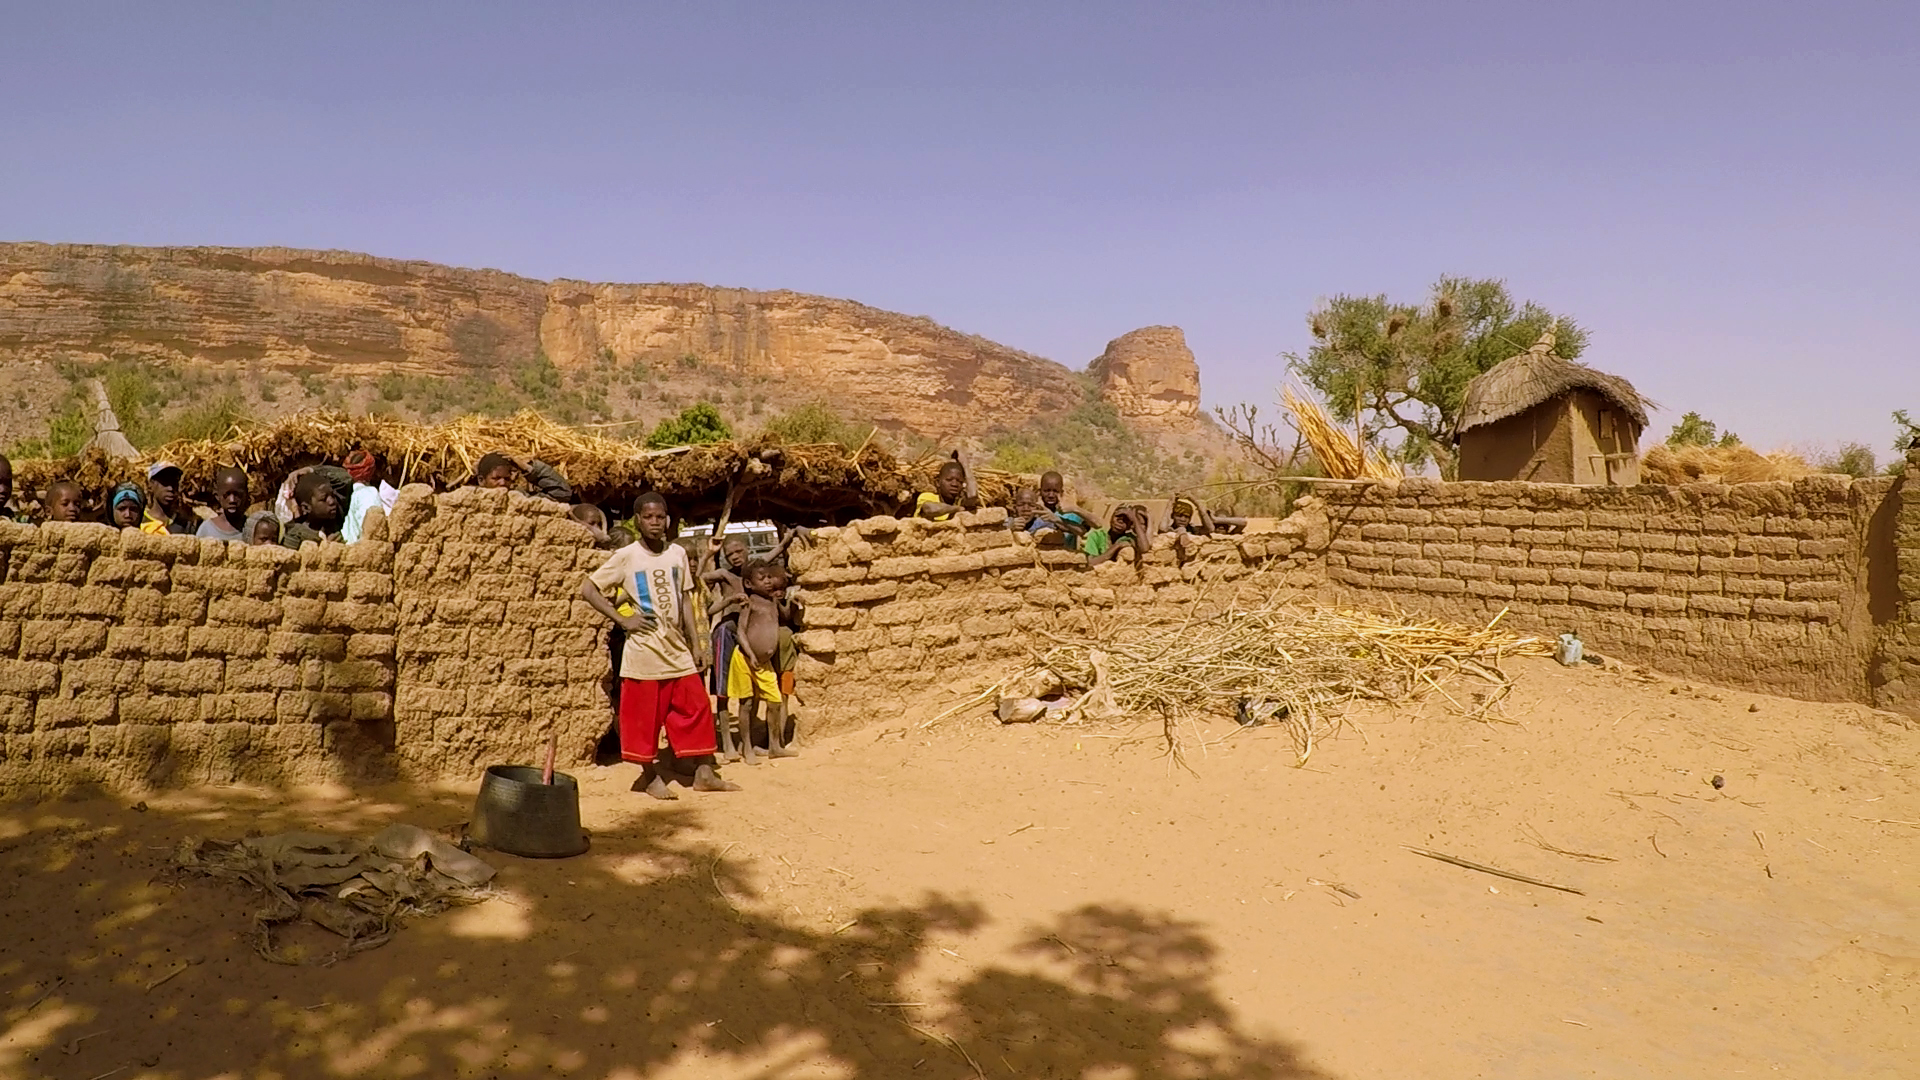 herrero dogon mali pablocaminante - Malí 8, País Dogon V: moda, arte y religión